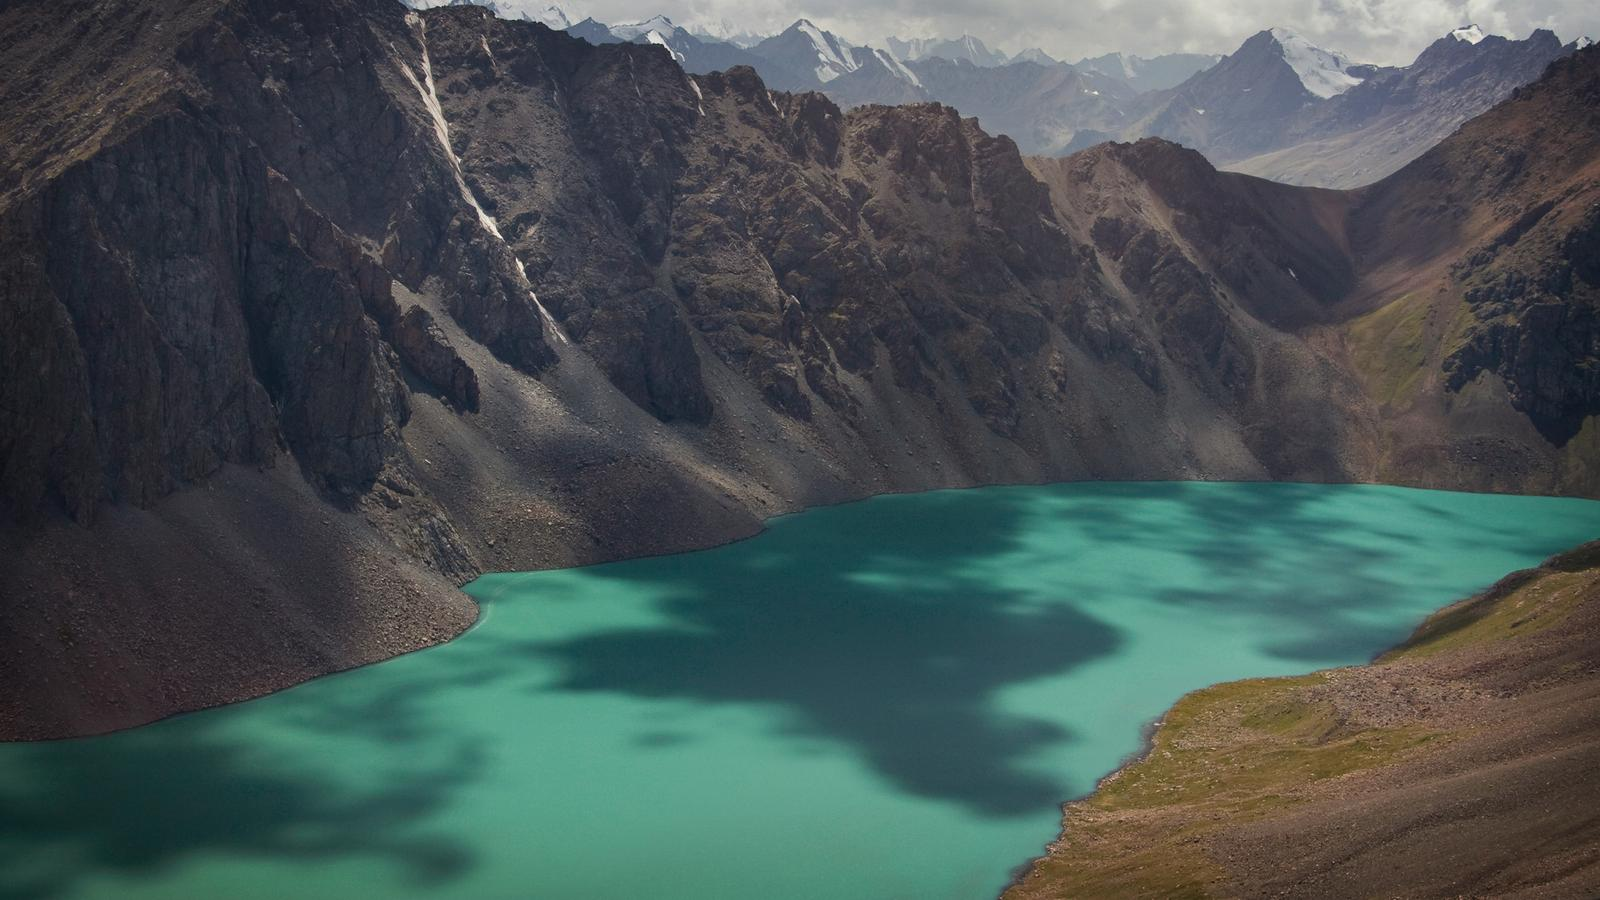 Kasachstan & Kirgisistan Erlebnisreise in der Gruppe traveljunkies